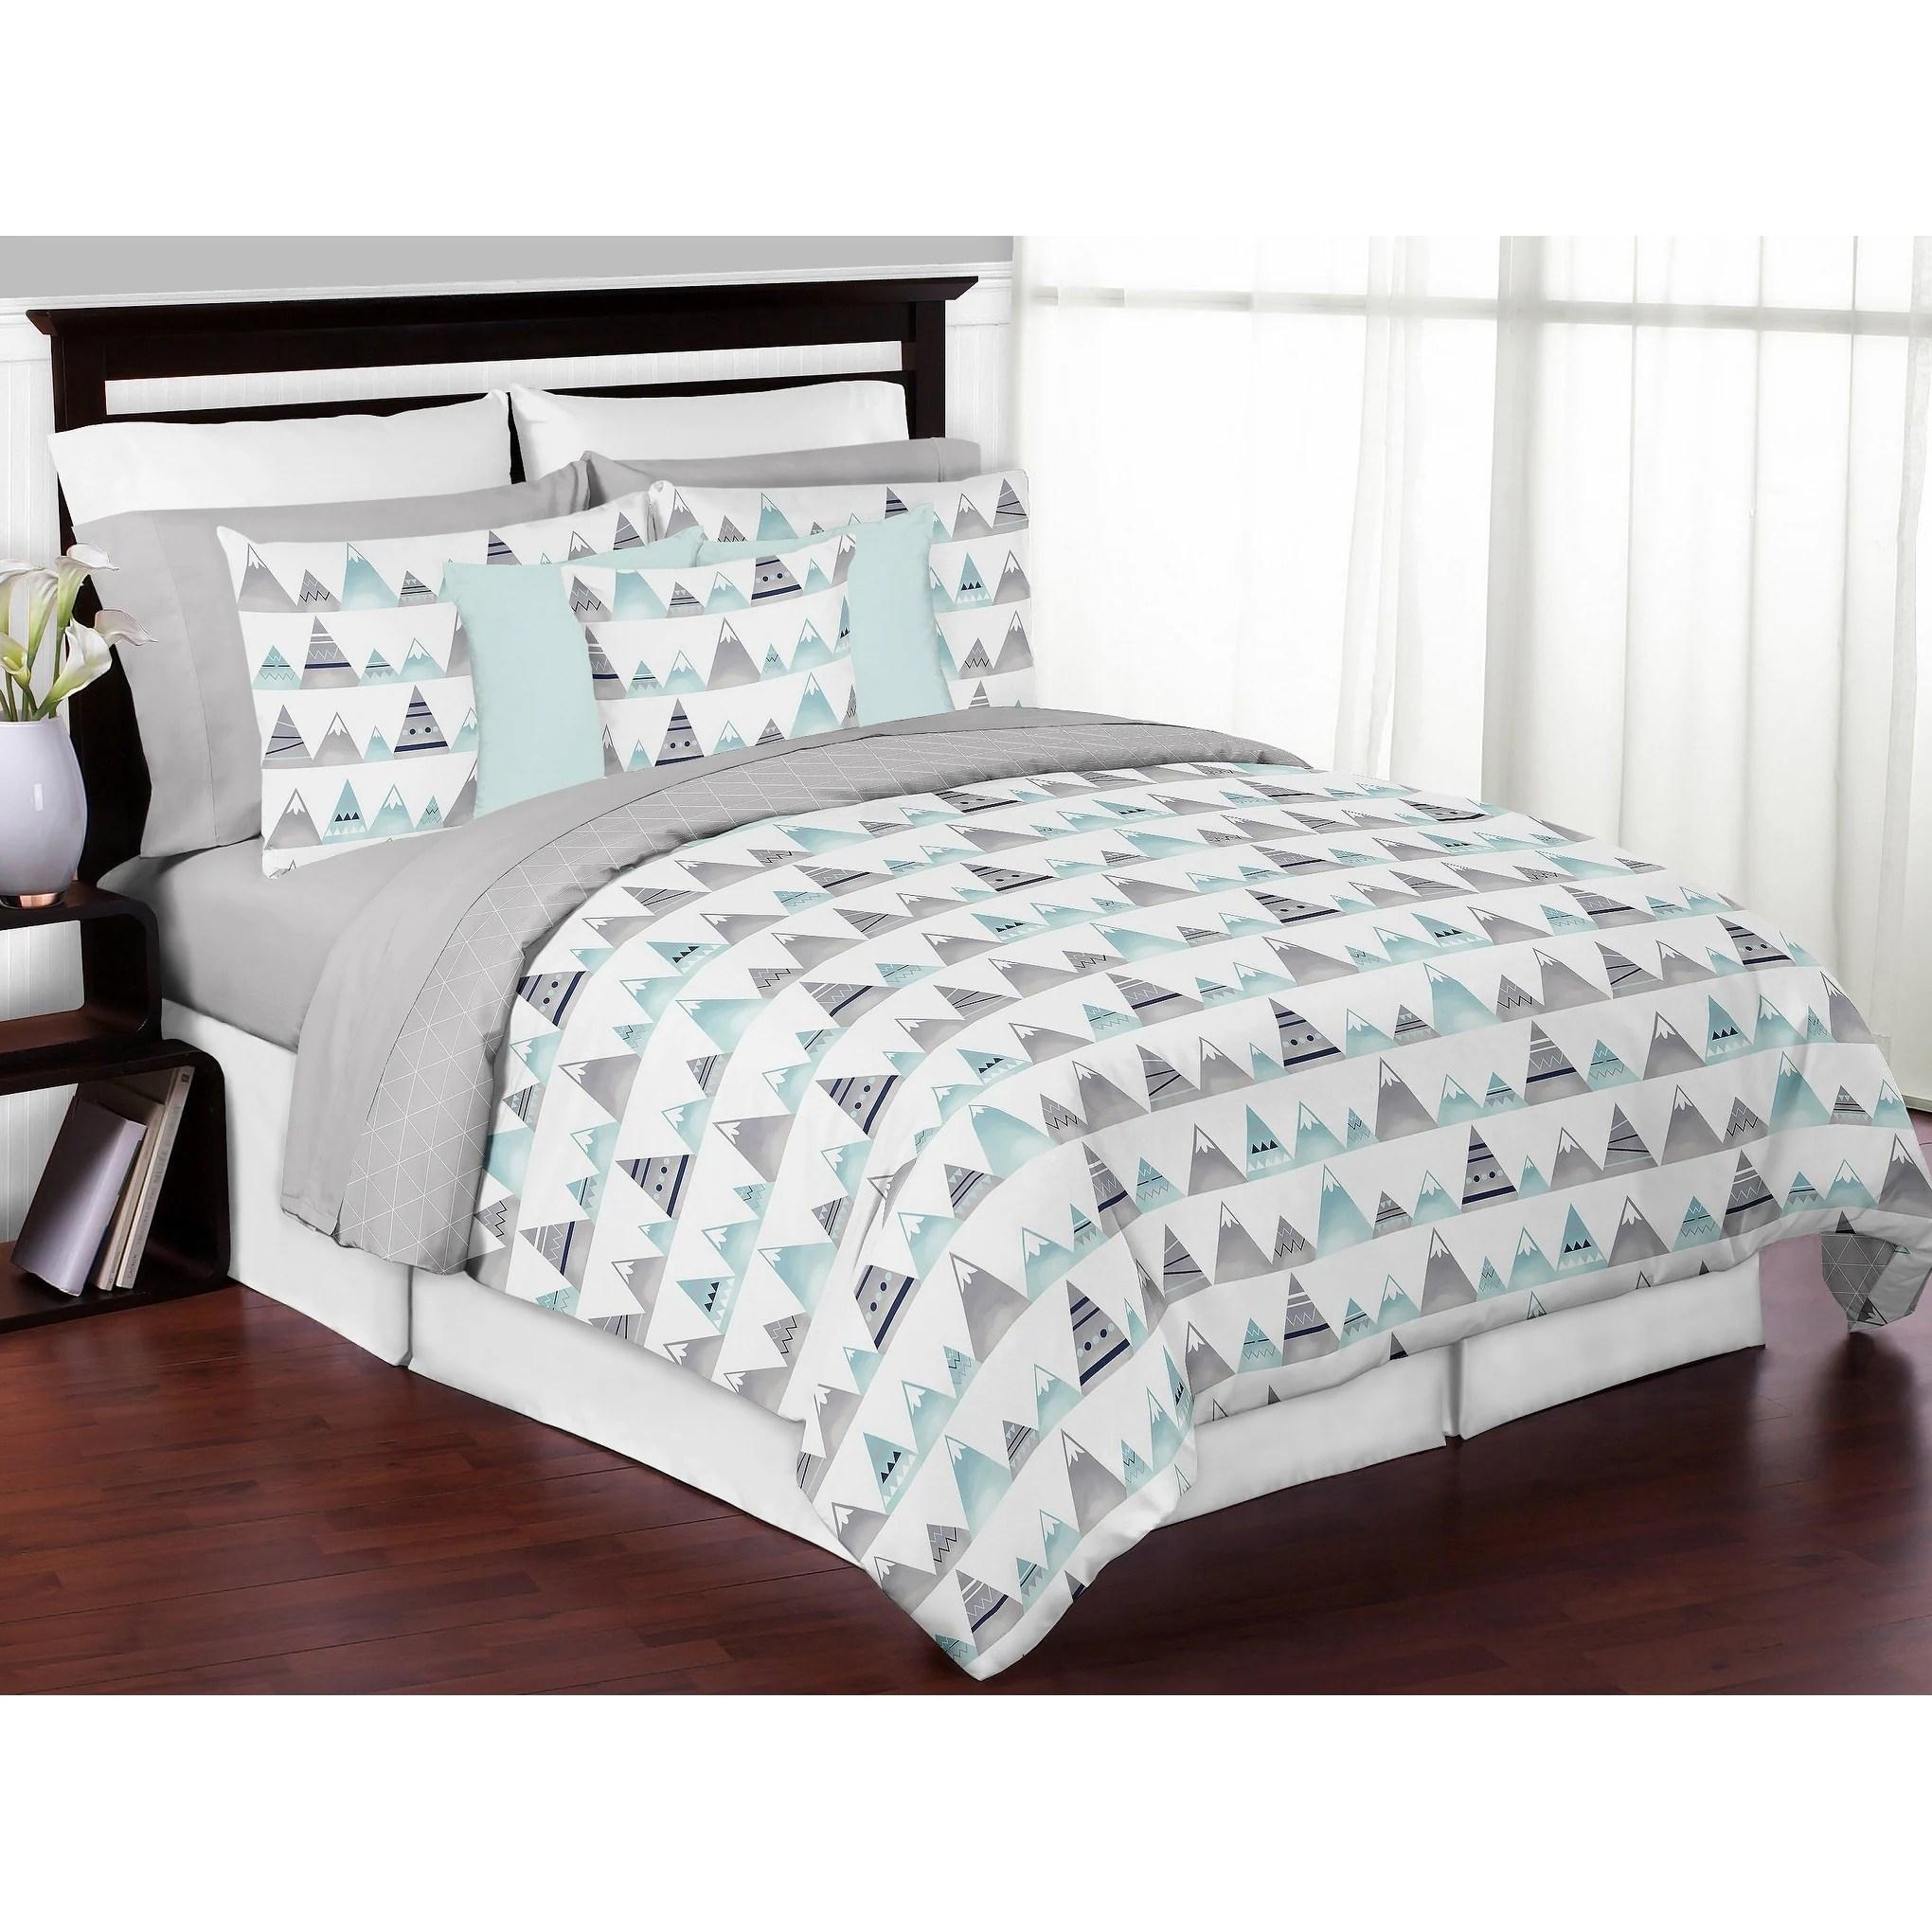 sweet jojo designs navy blue aqua and grey aztec mountains collection boy girl 3 piece full queen size comforter set